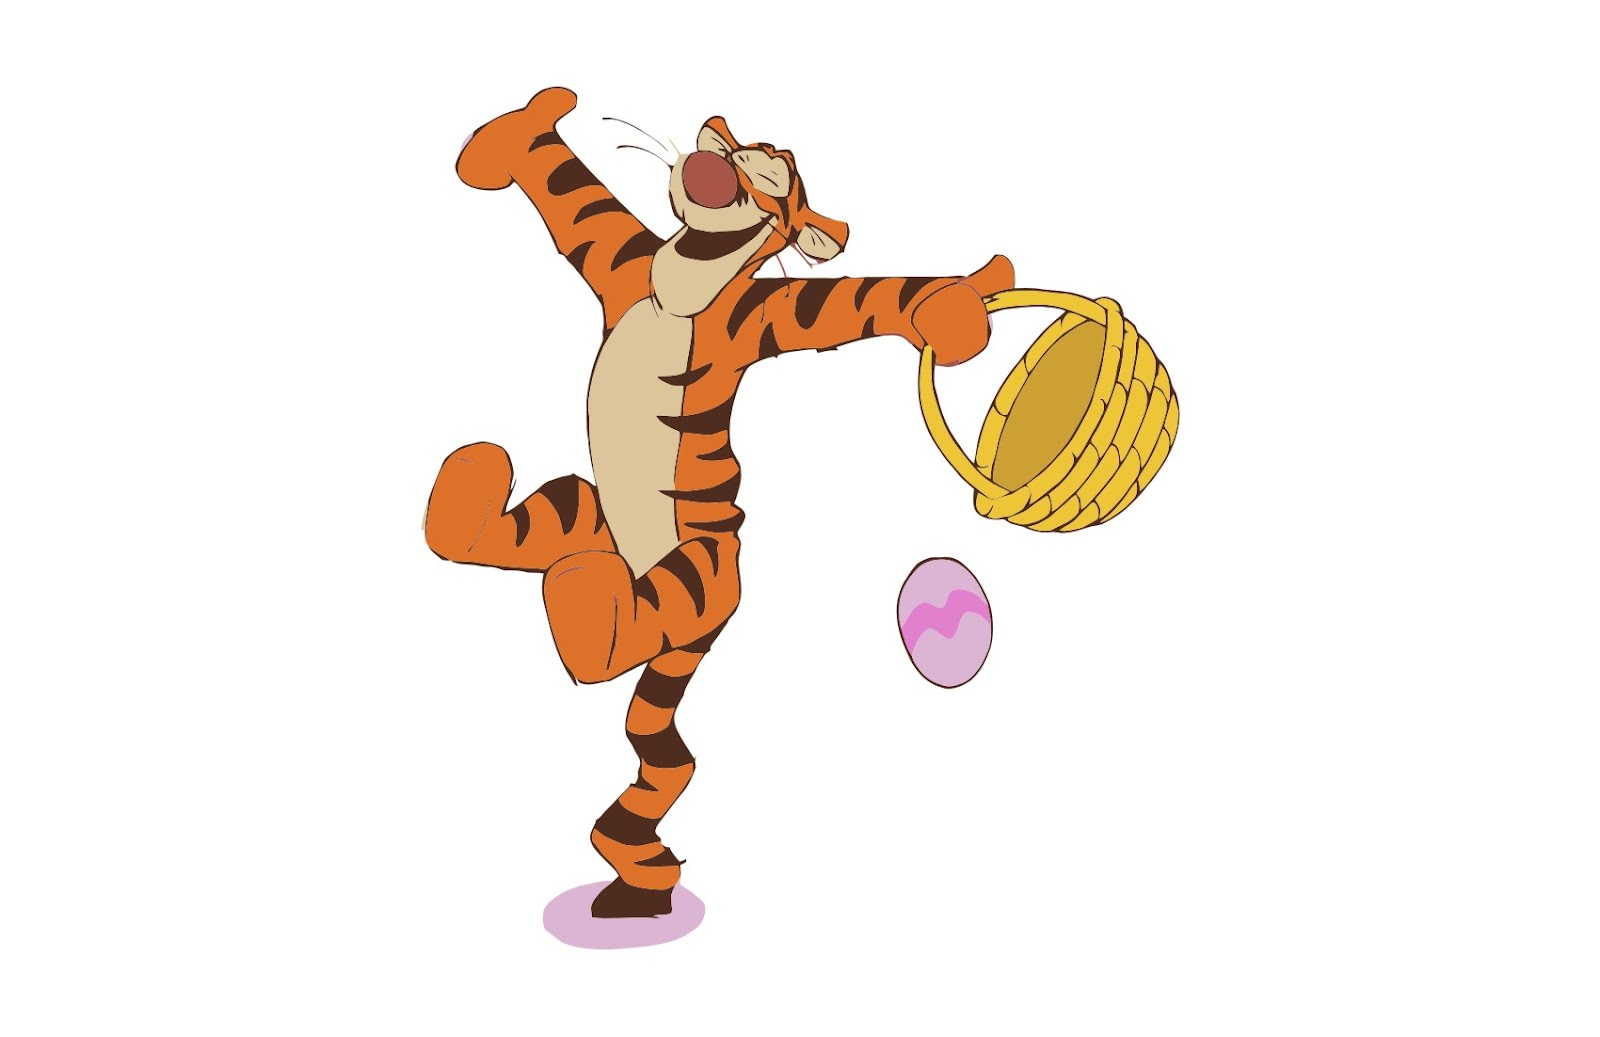 Tekken 5 Hd Wallpaper Download Winnie The Pooh With Tiger Vector Game